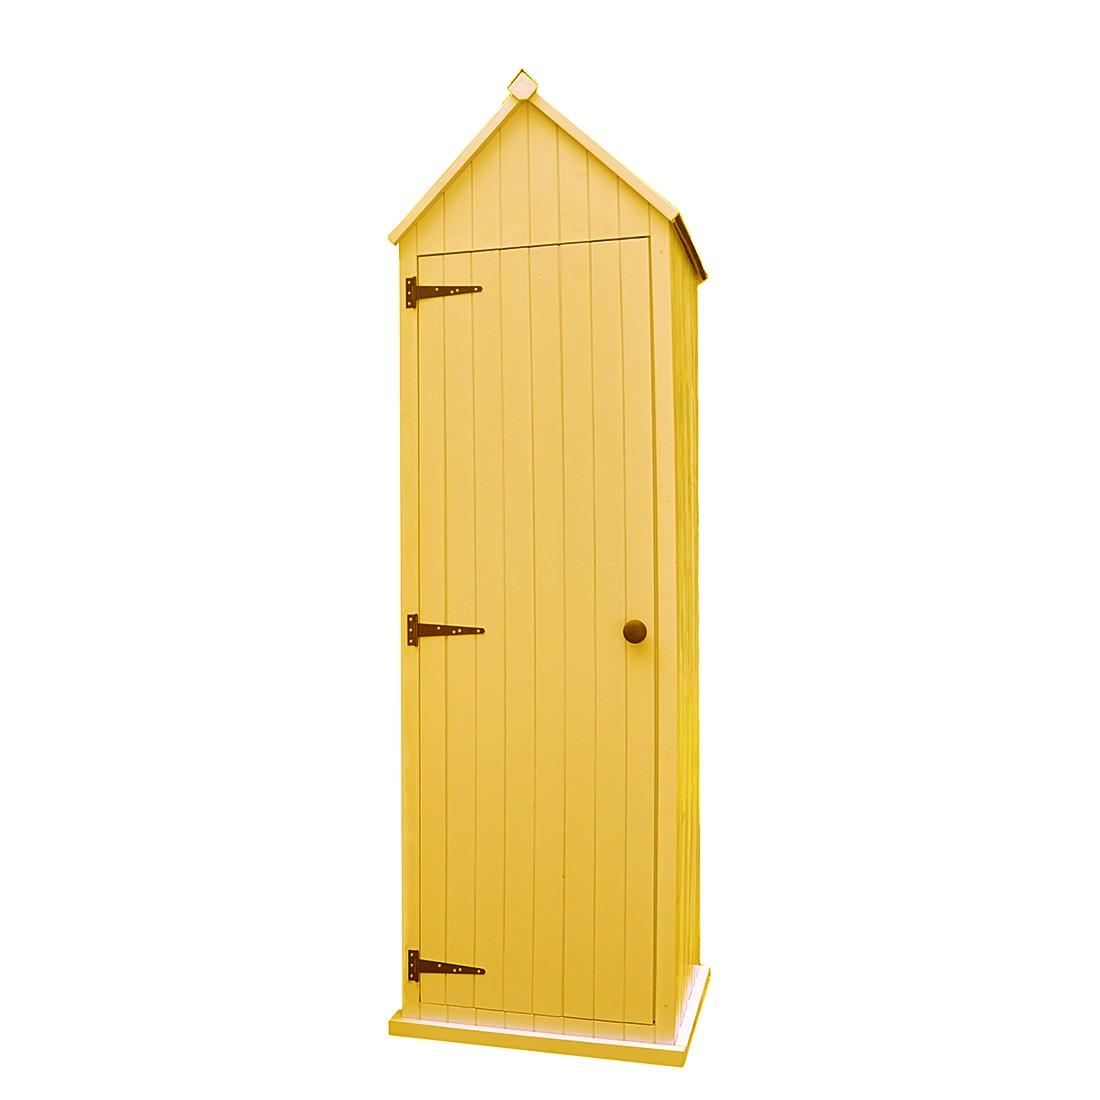 Gartenschrank Color – Fichte massiv – Gelb, Leco bestellen